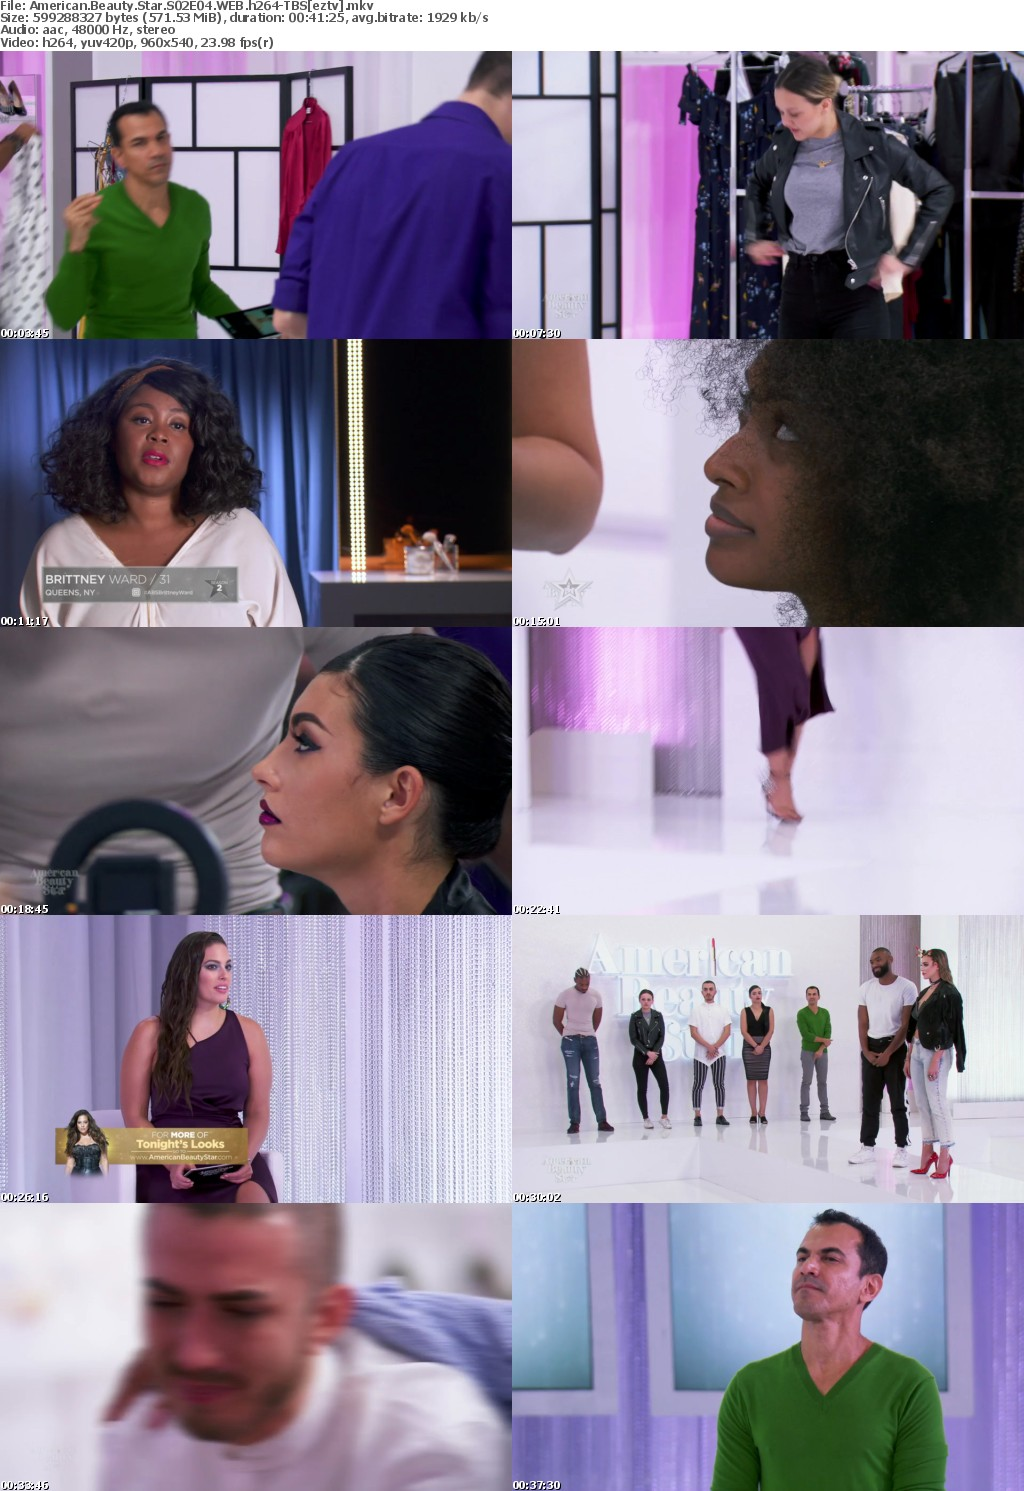 American Beauty Star S02E04 WEB h264-TBS